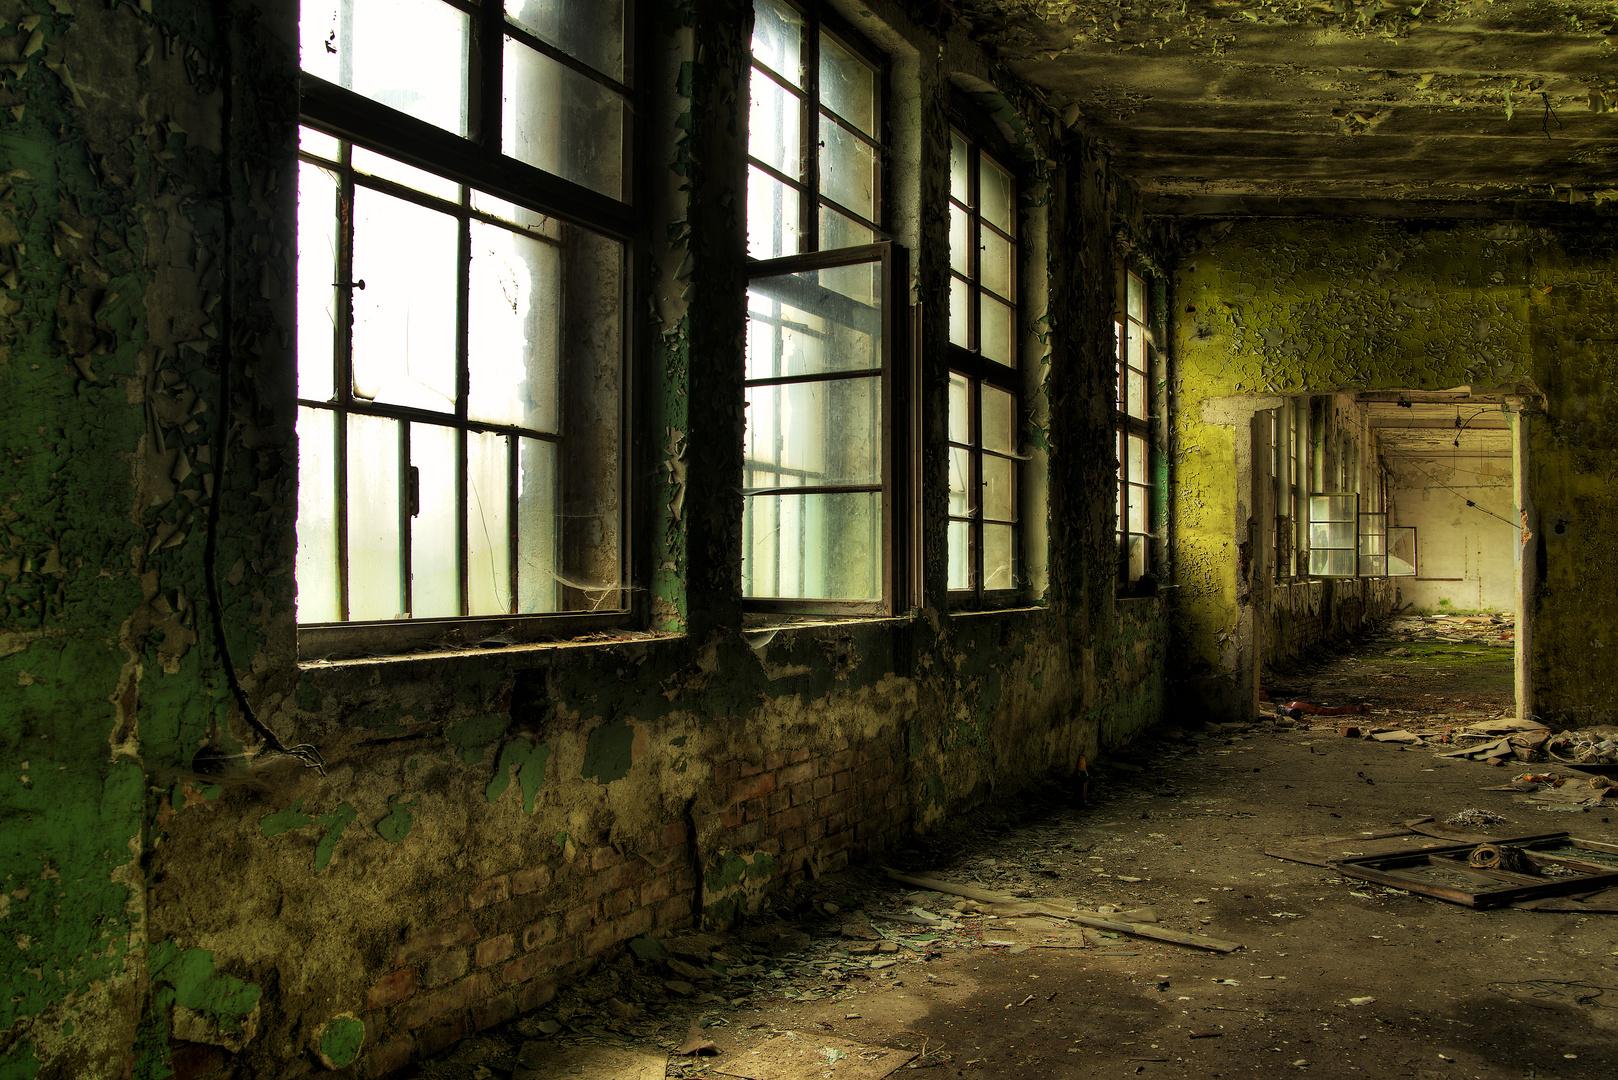 *** the windows are ........ ***